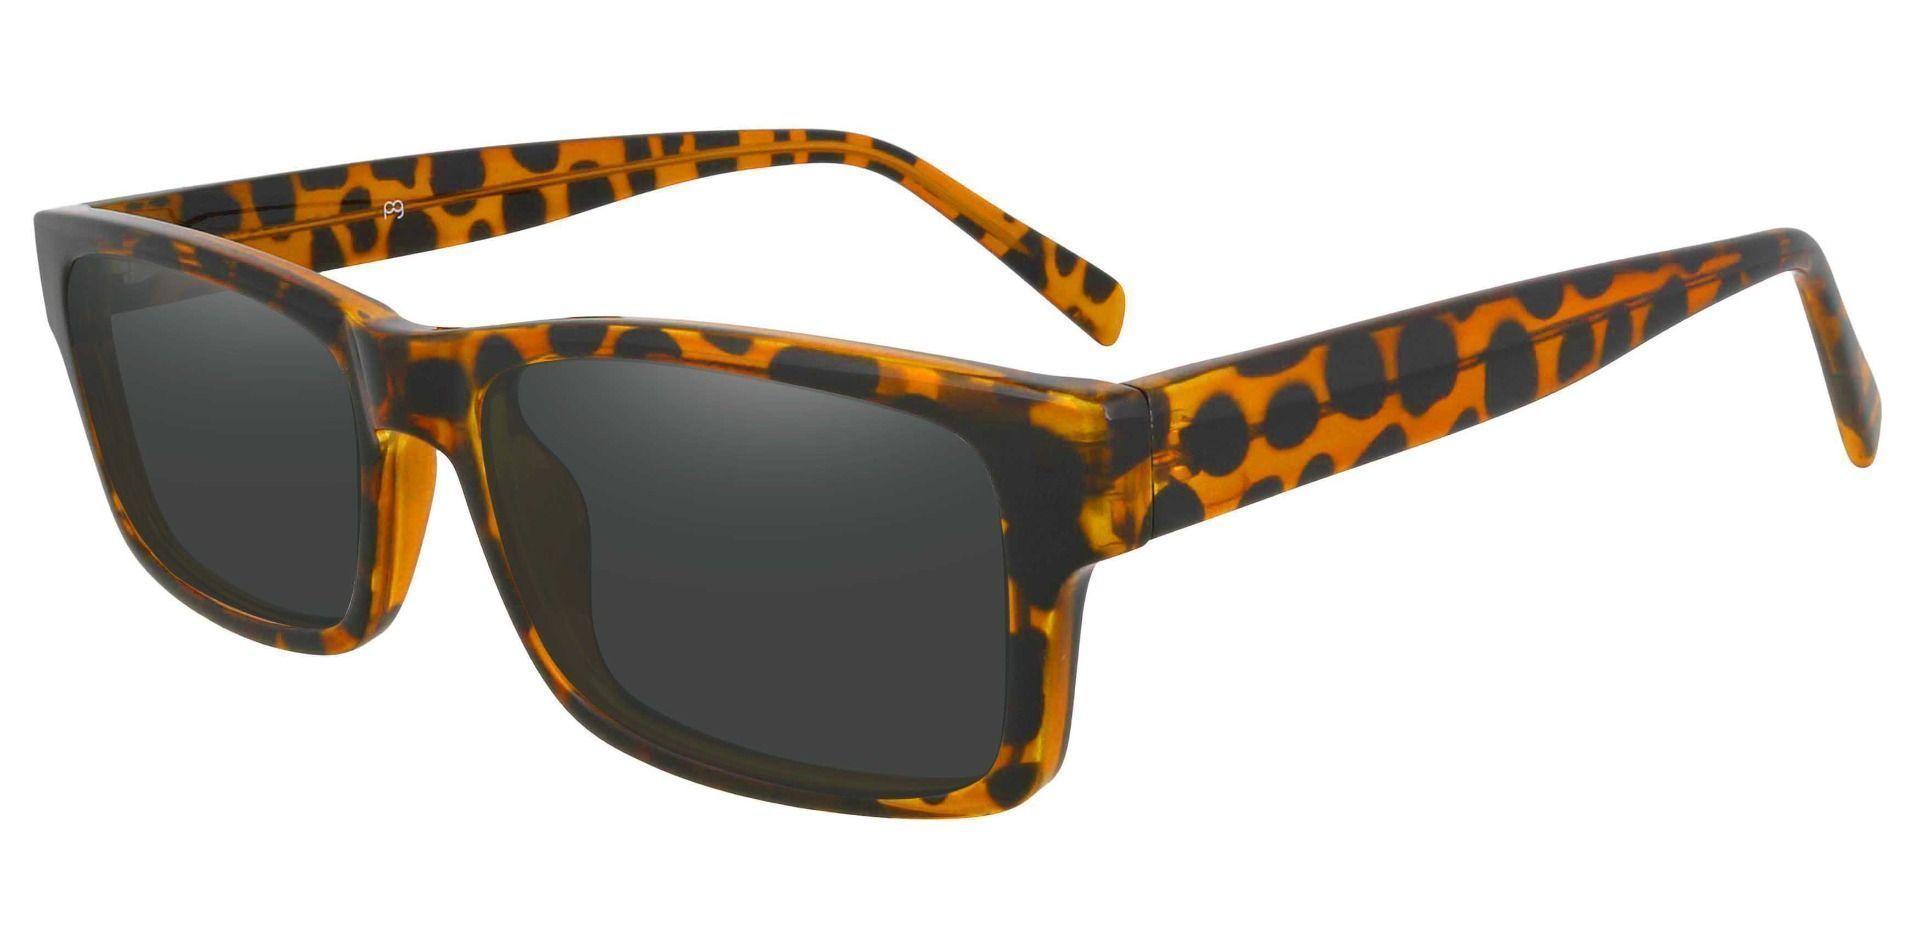 Eclipse Rectangle Prescription Sunglasses - Tortoise Frame With Gray Lenses